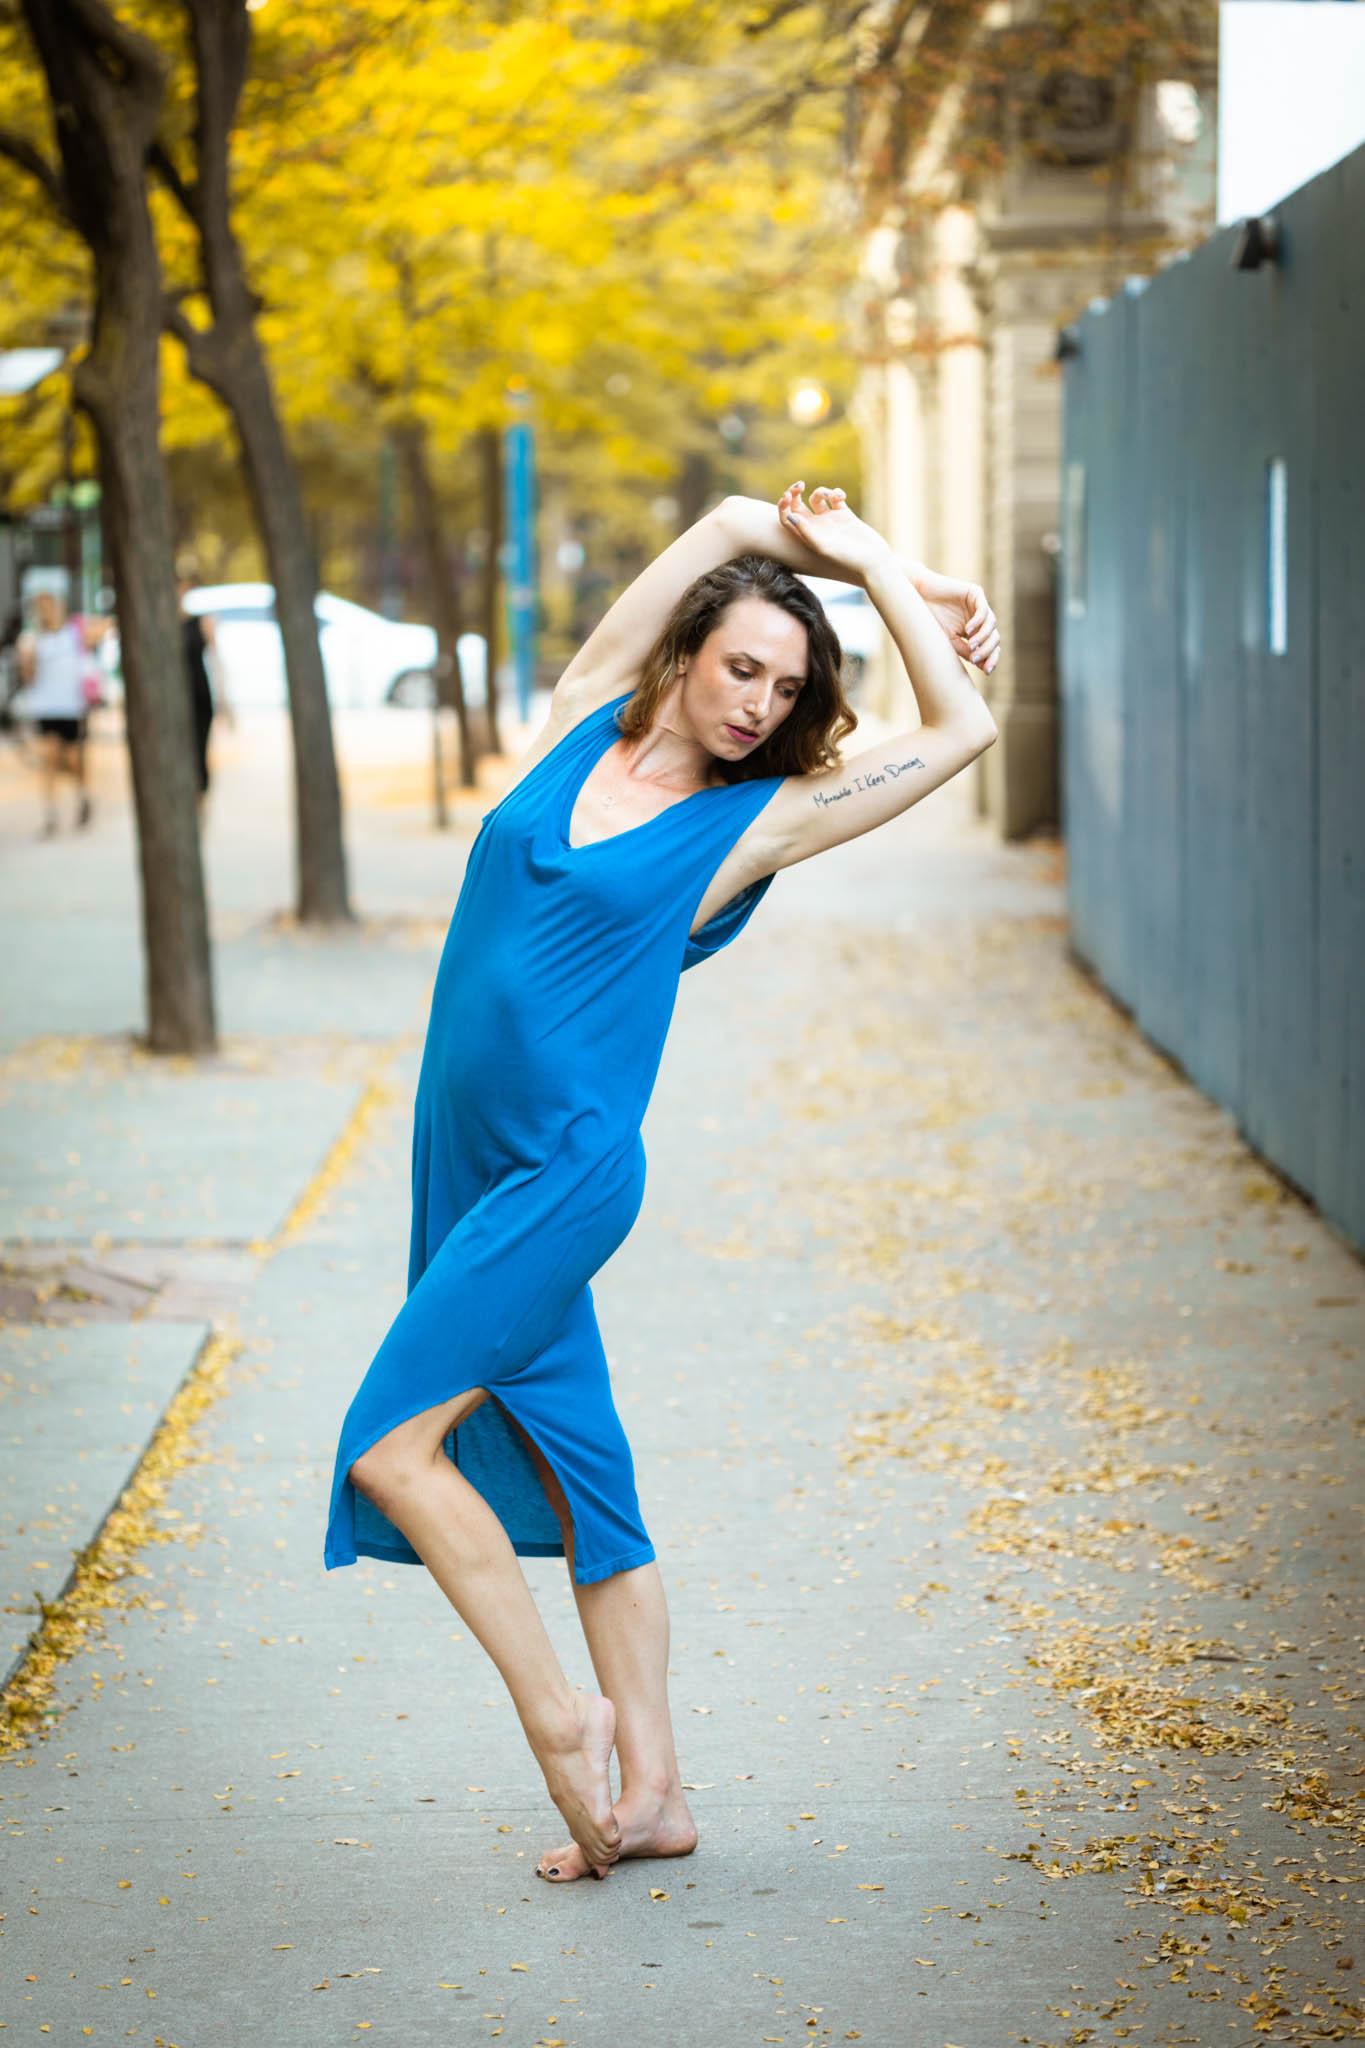 Julie McLachlan - 128 - 9998.jpg